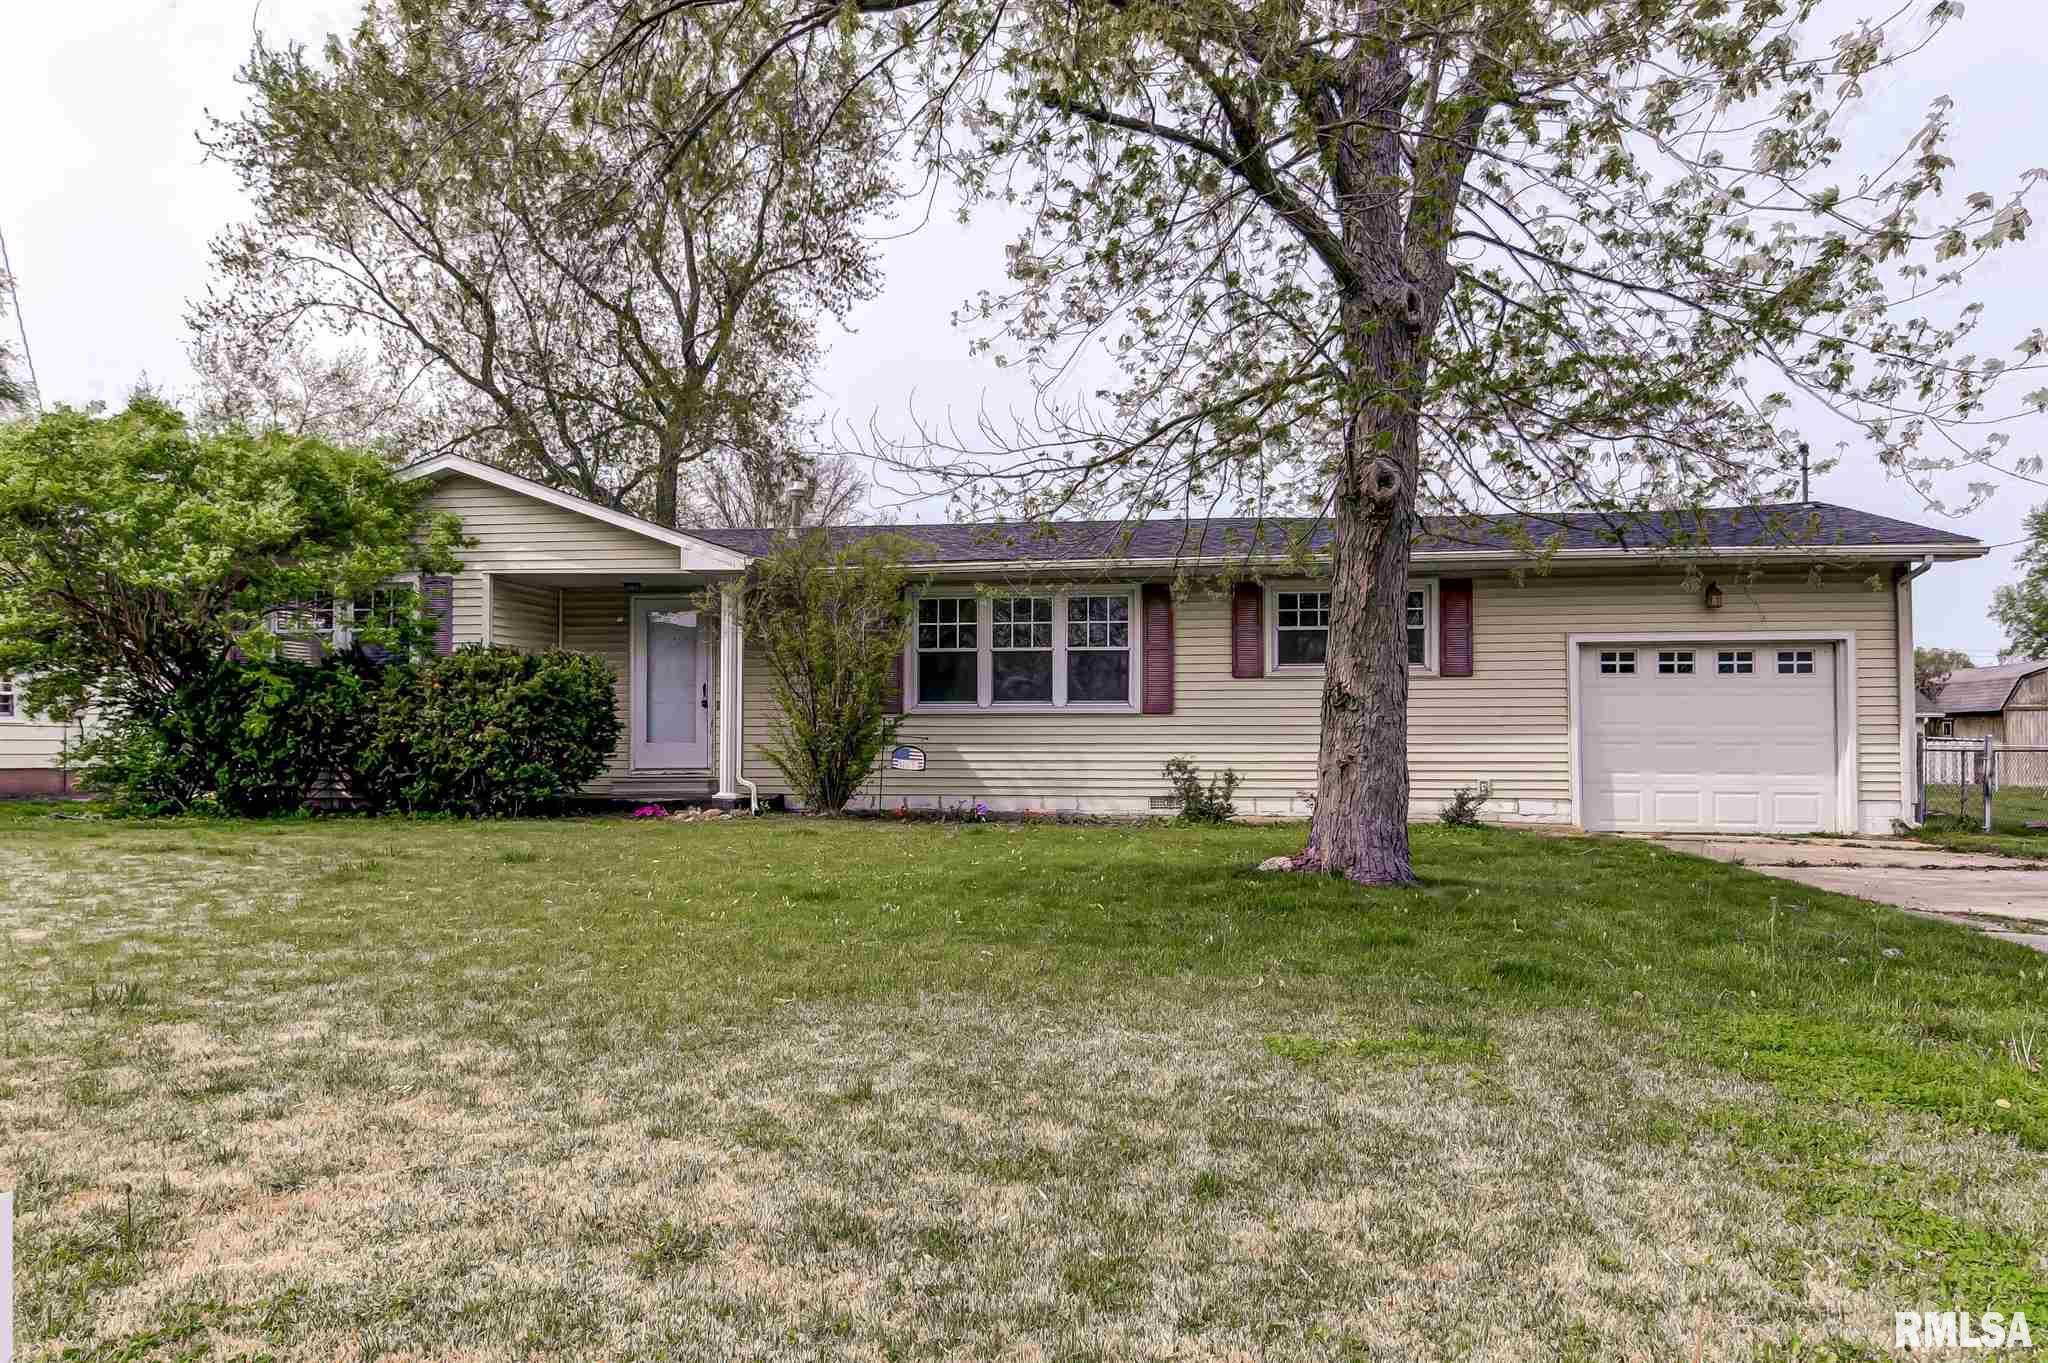 1103 RUTLEDGE Property Photo - Pawnee, IL real estate listing